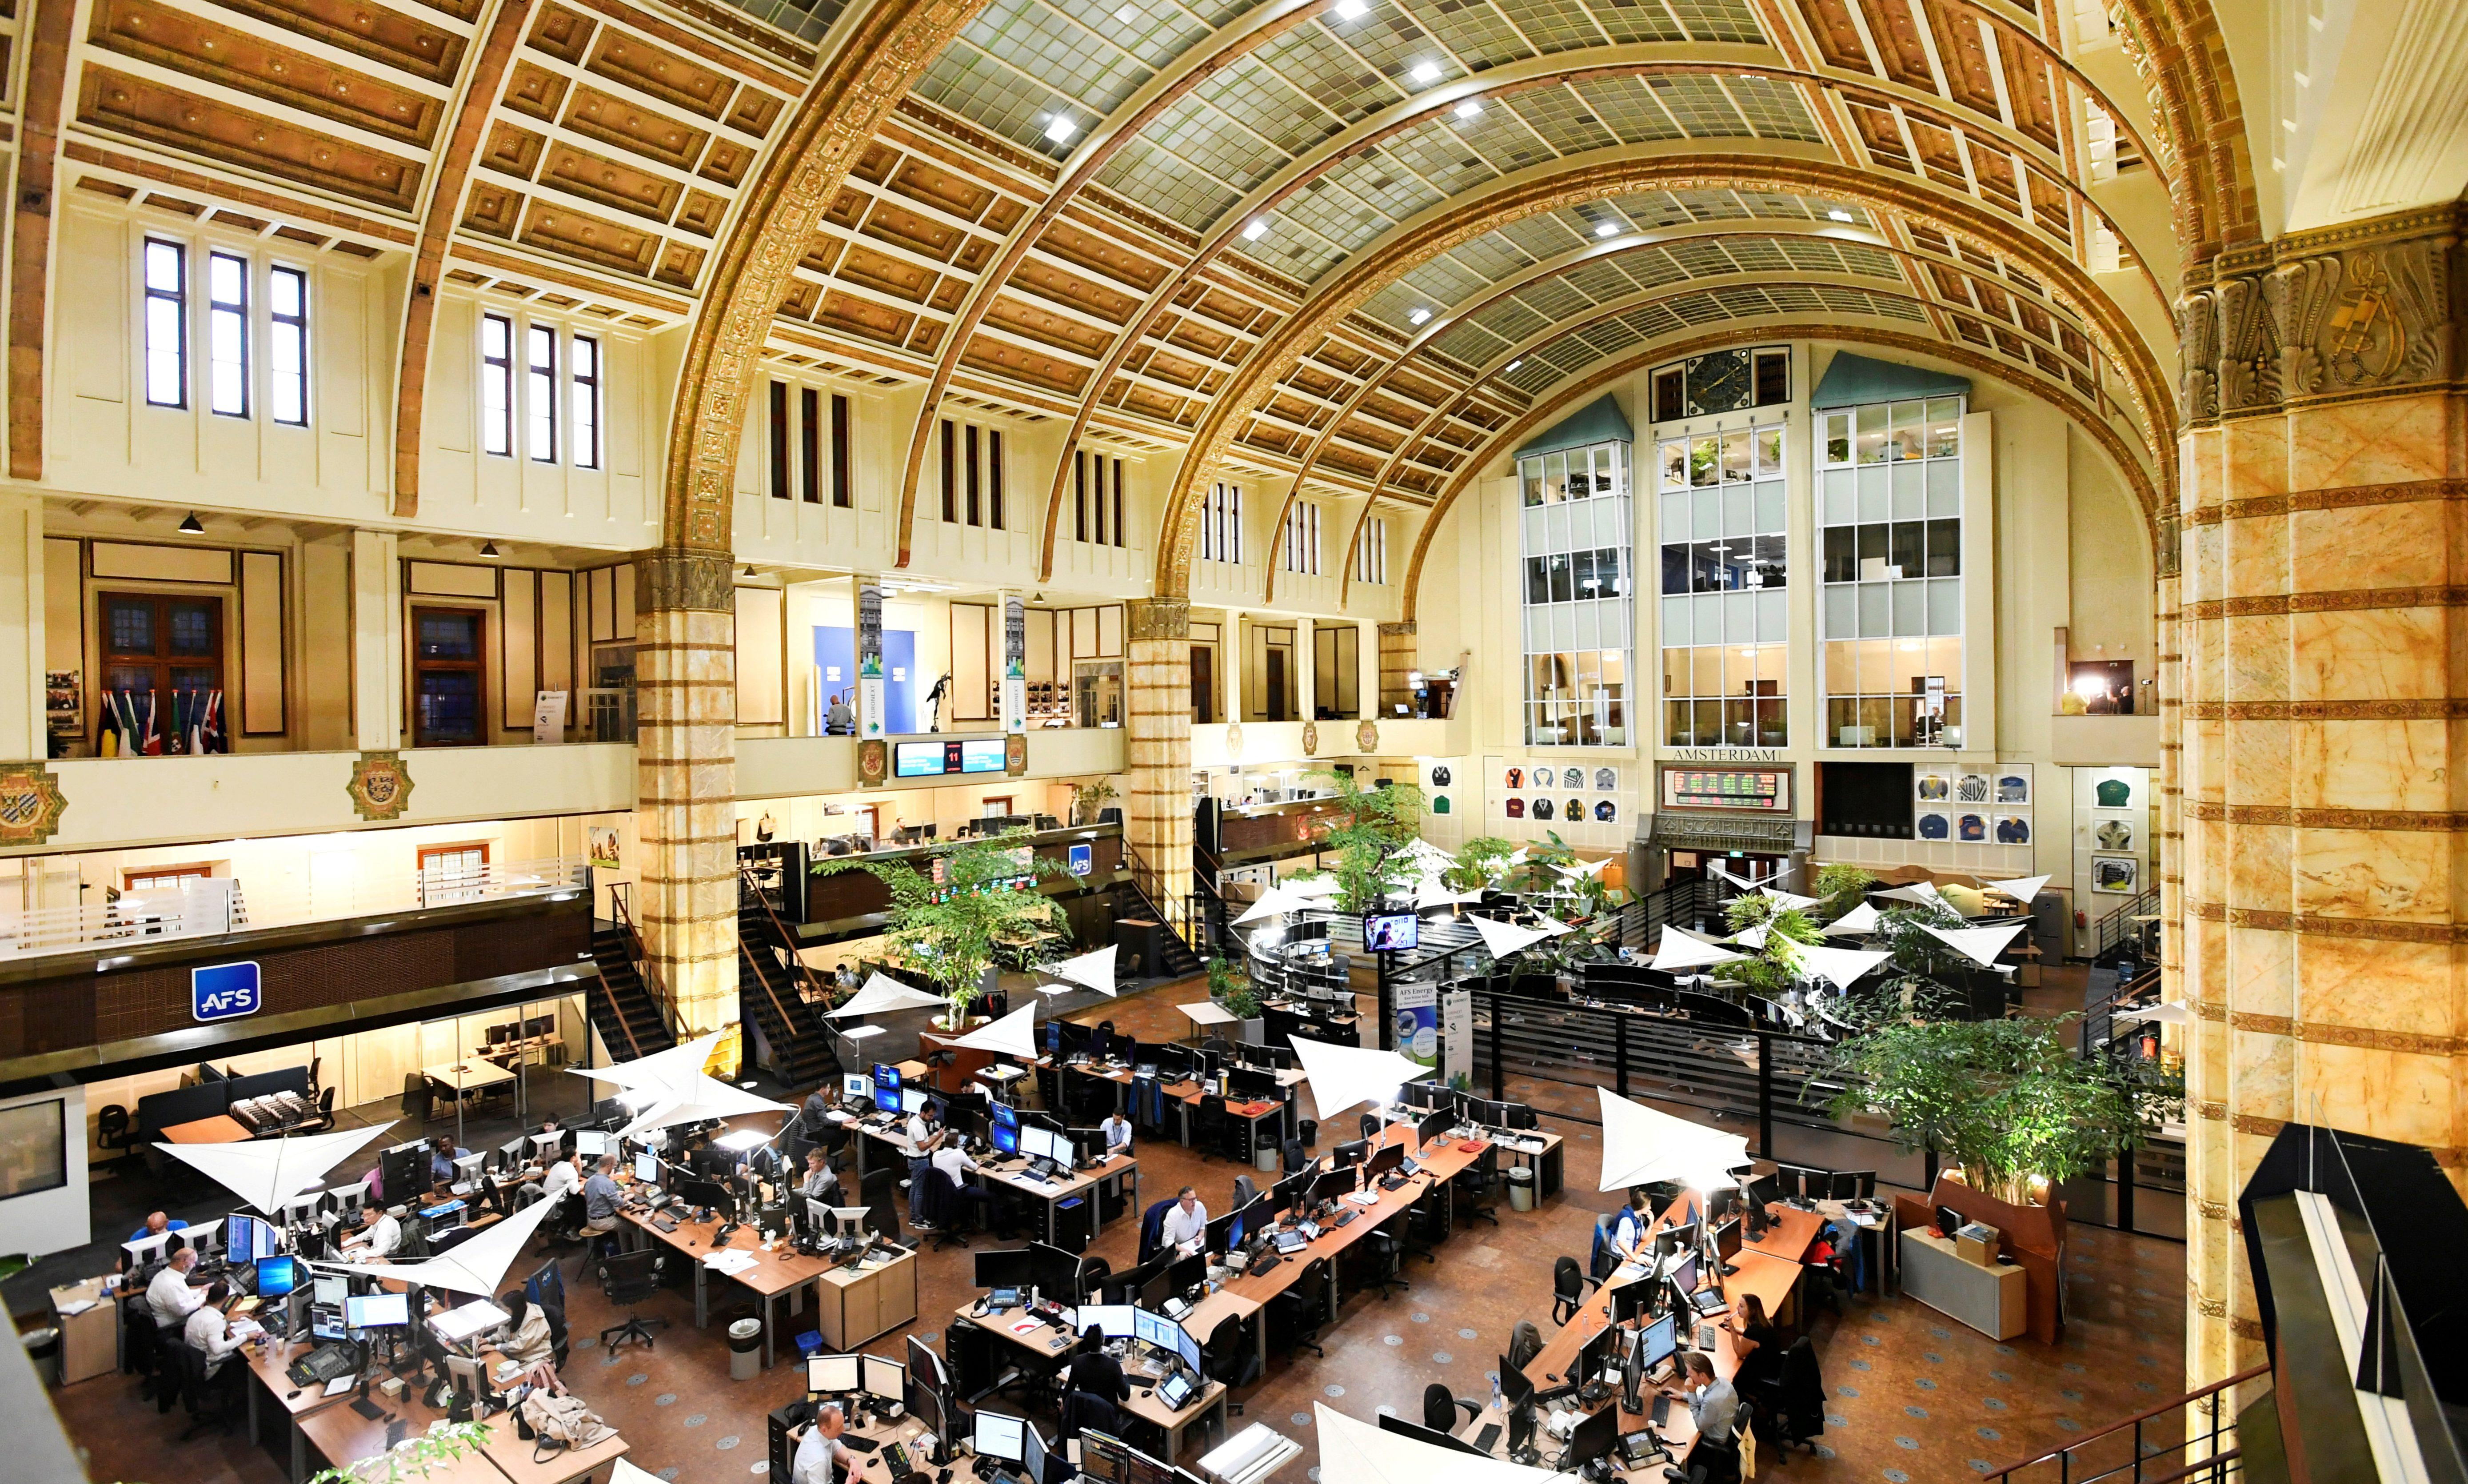 Overview of Amsterdam's stock exchange interior